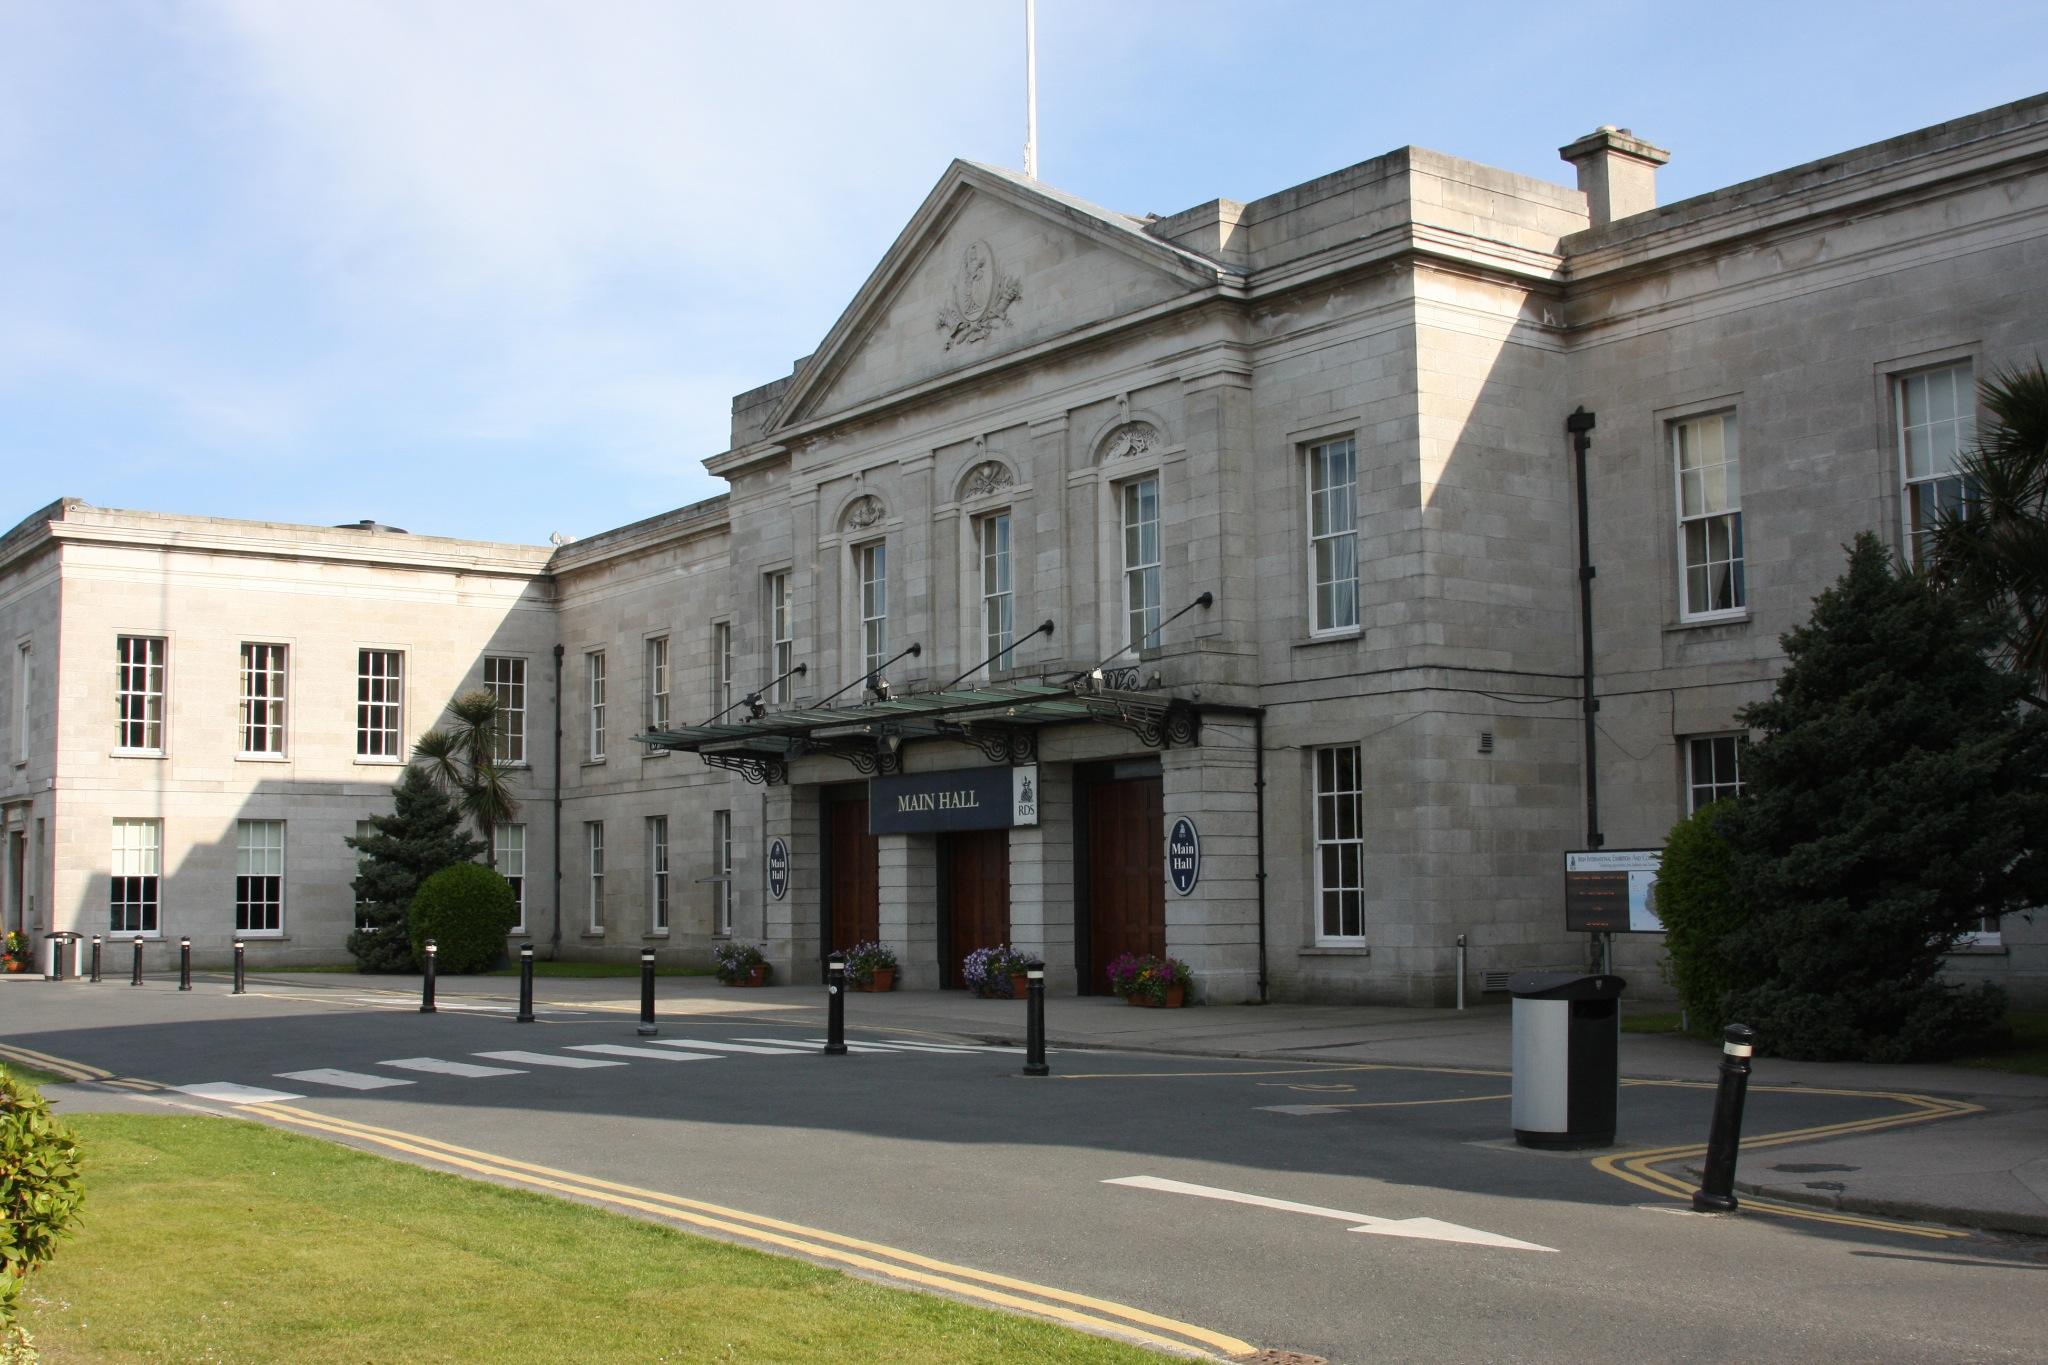 The Main Hall at the RDS, Dublin